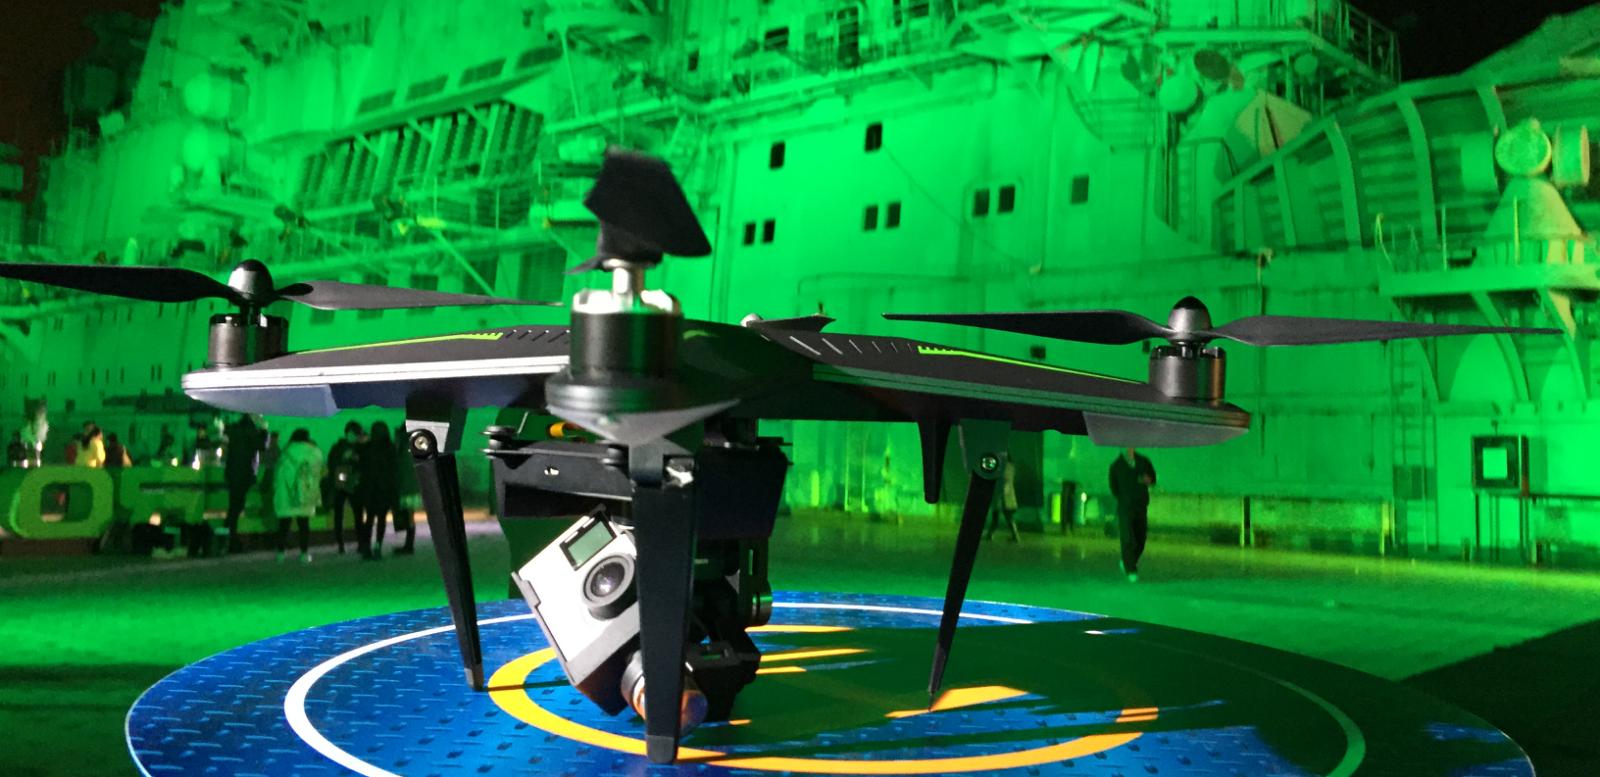 Explorer :降落在明斯克航母上的无人机